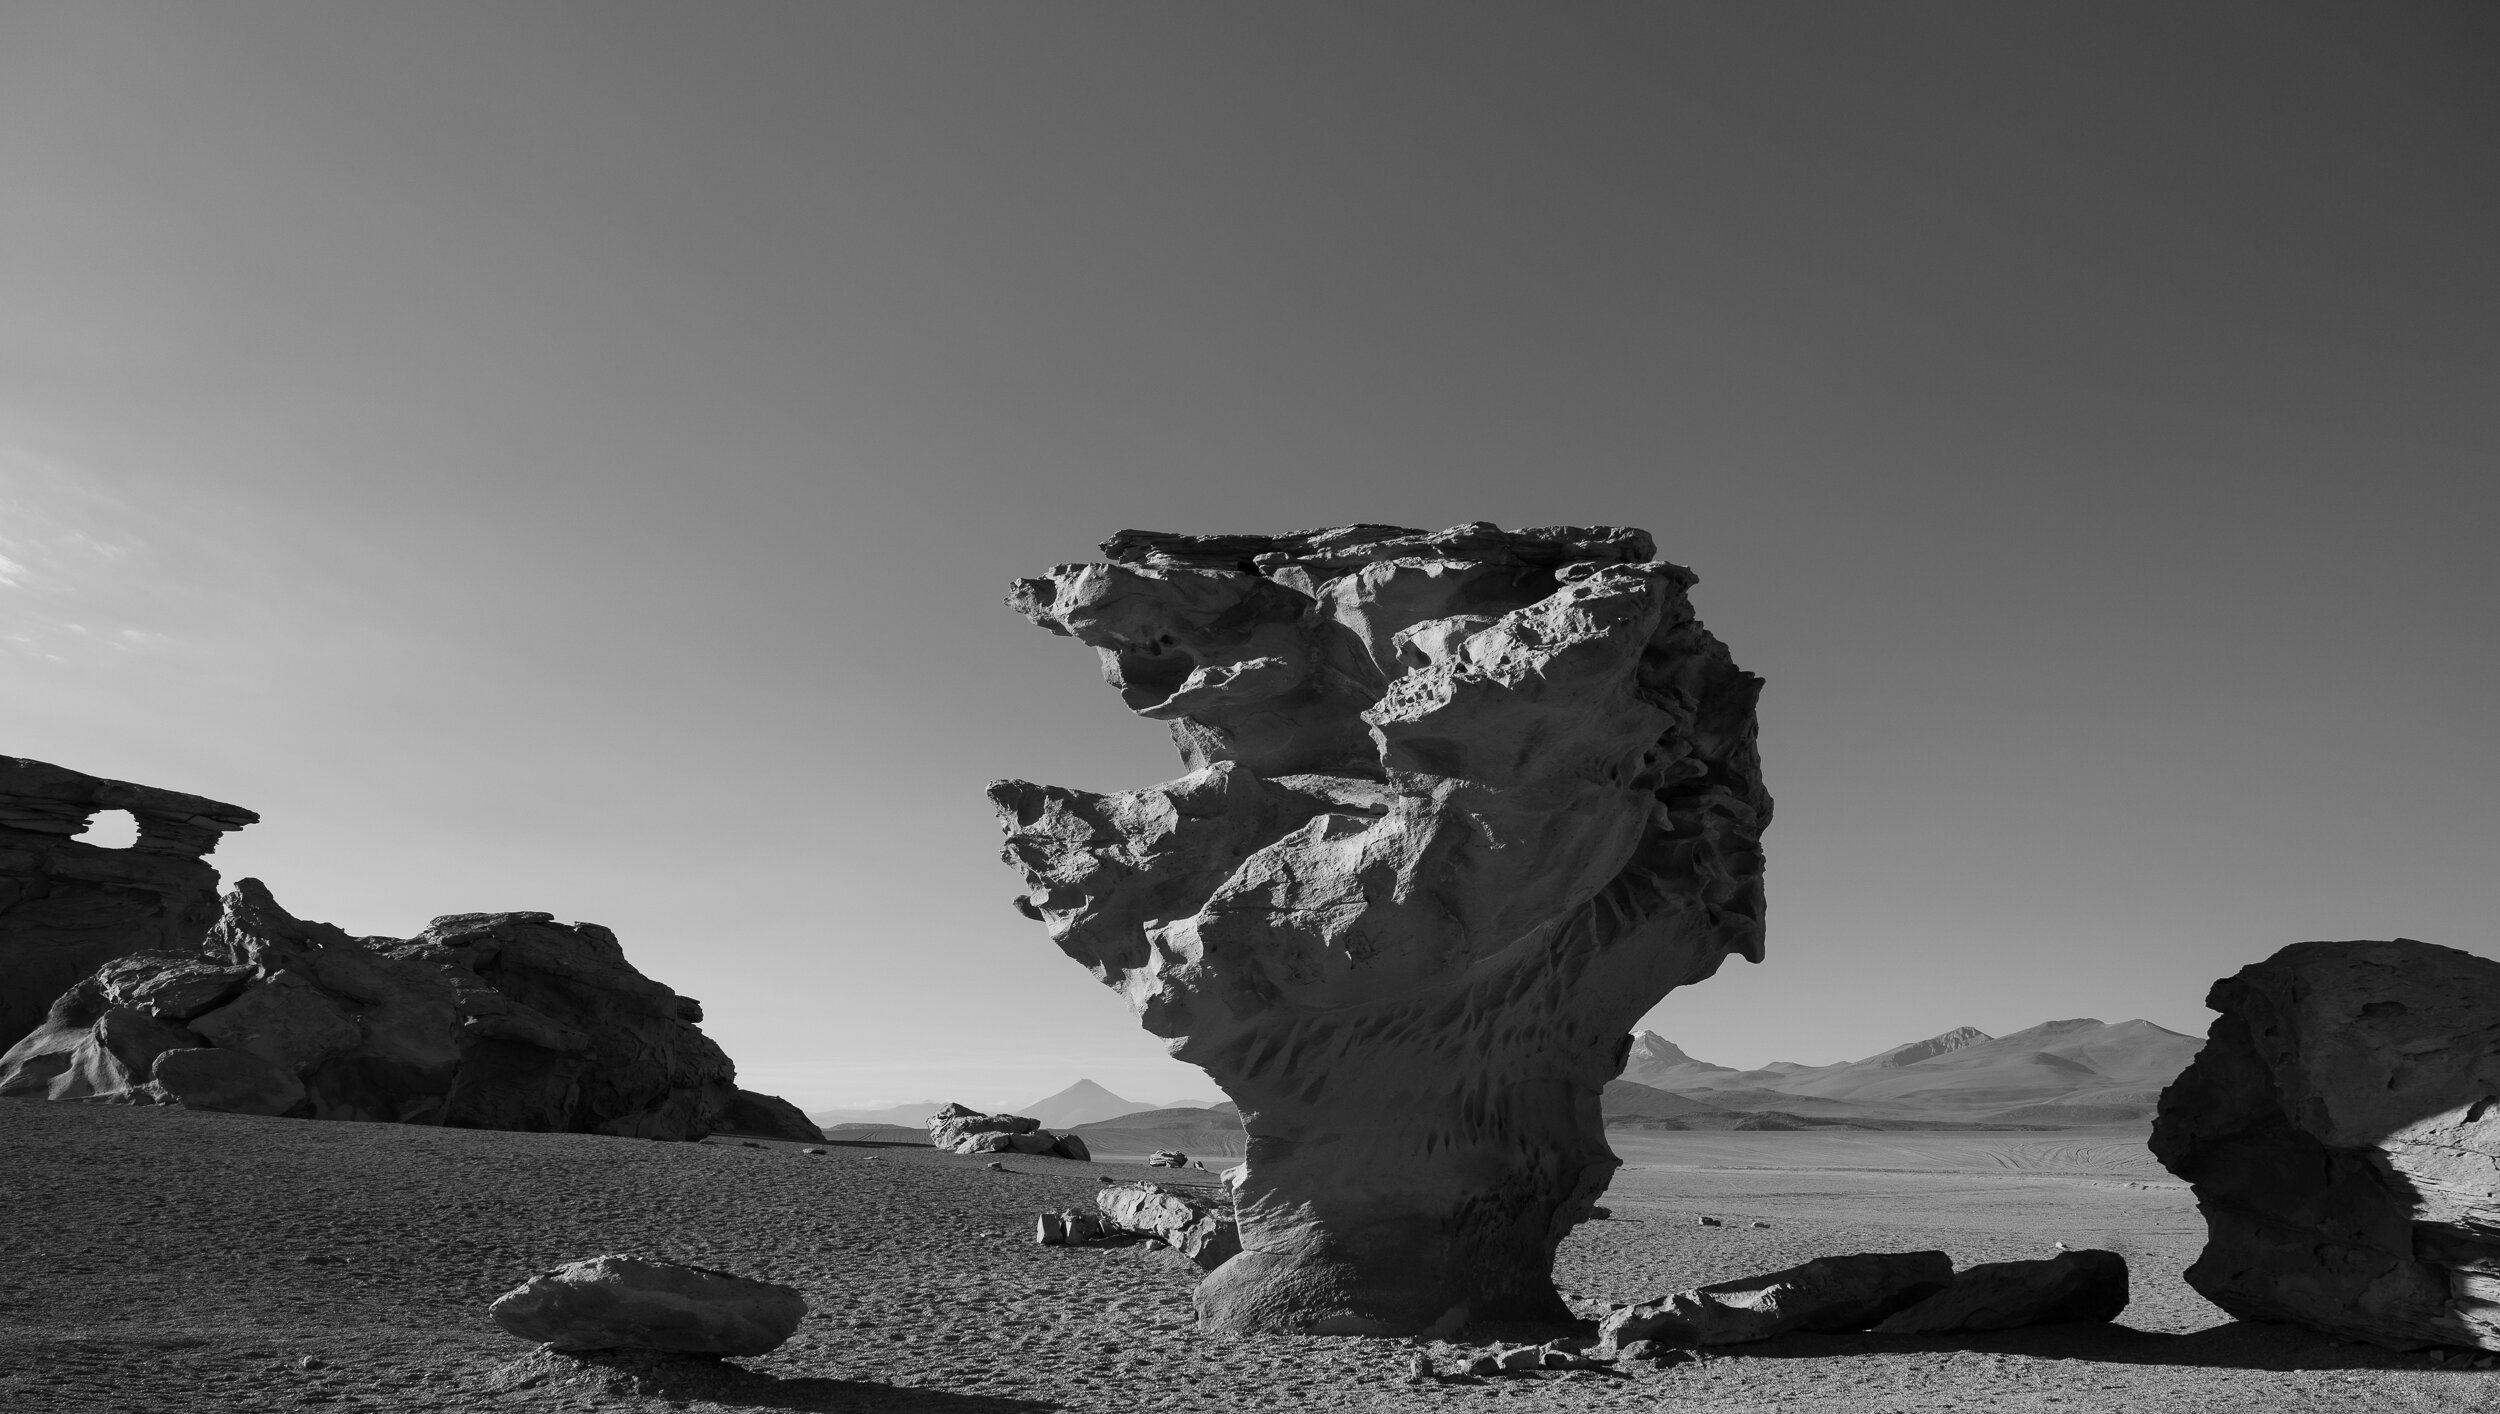 Bolivia-6342-Edit.jpg